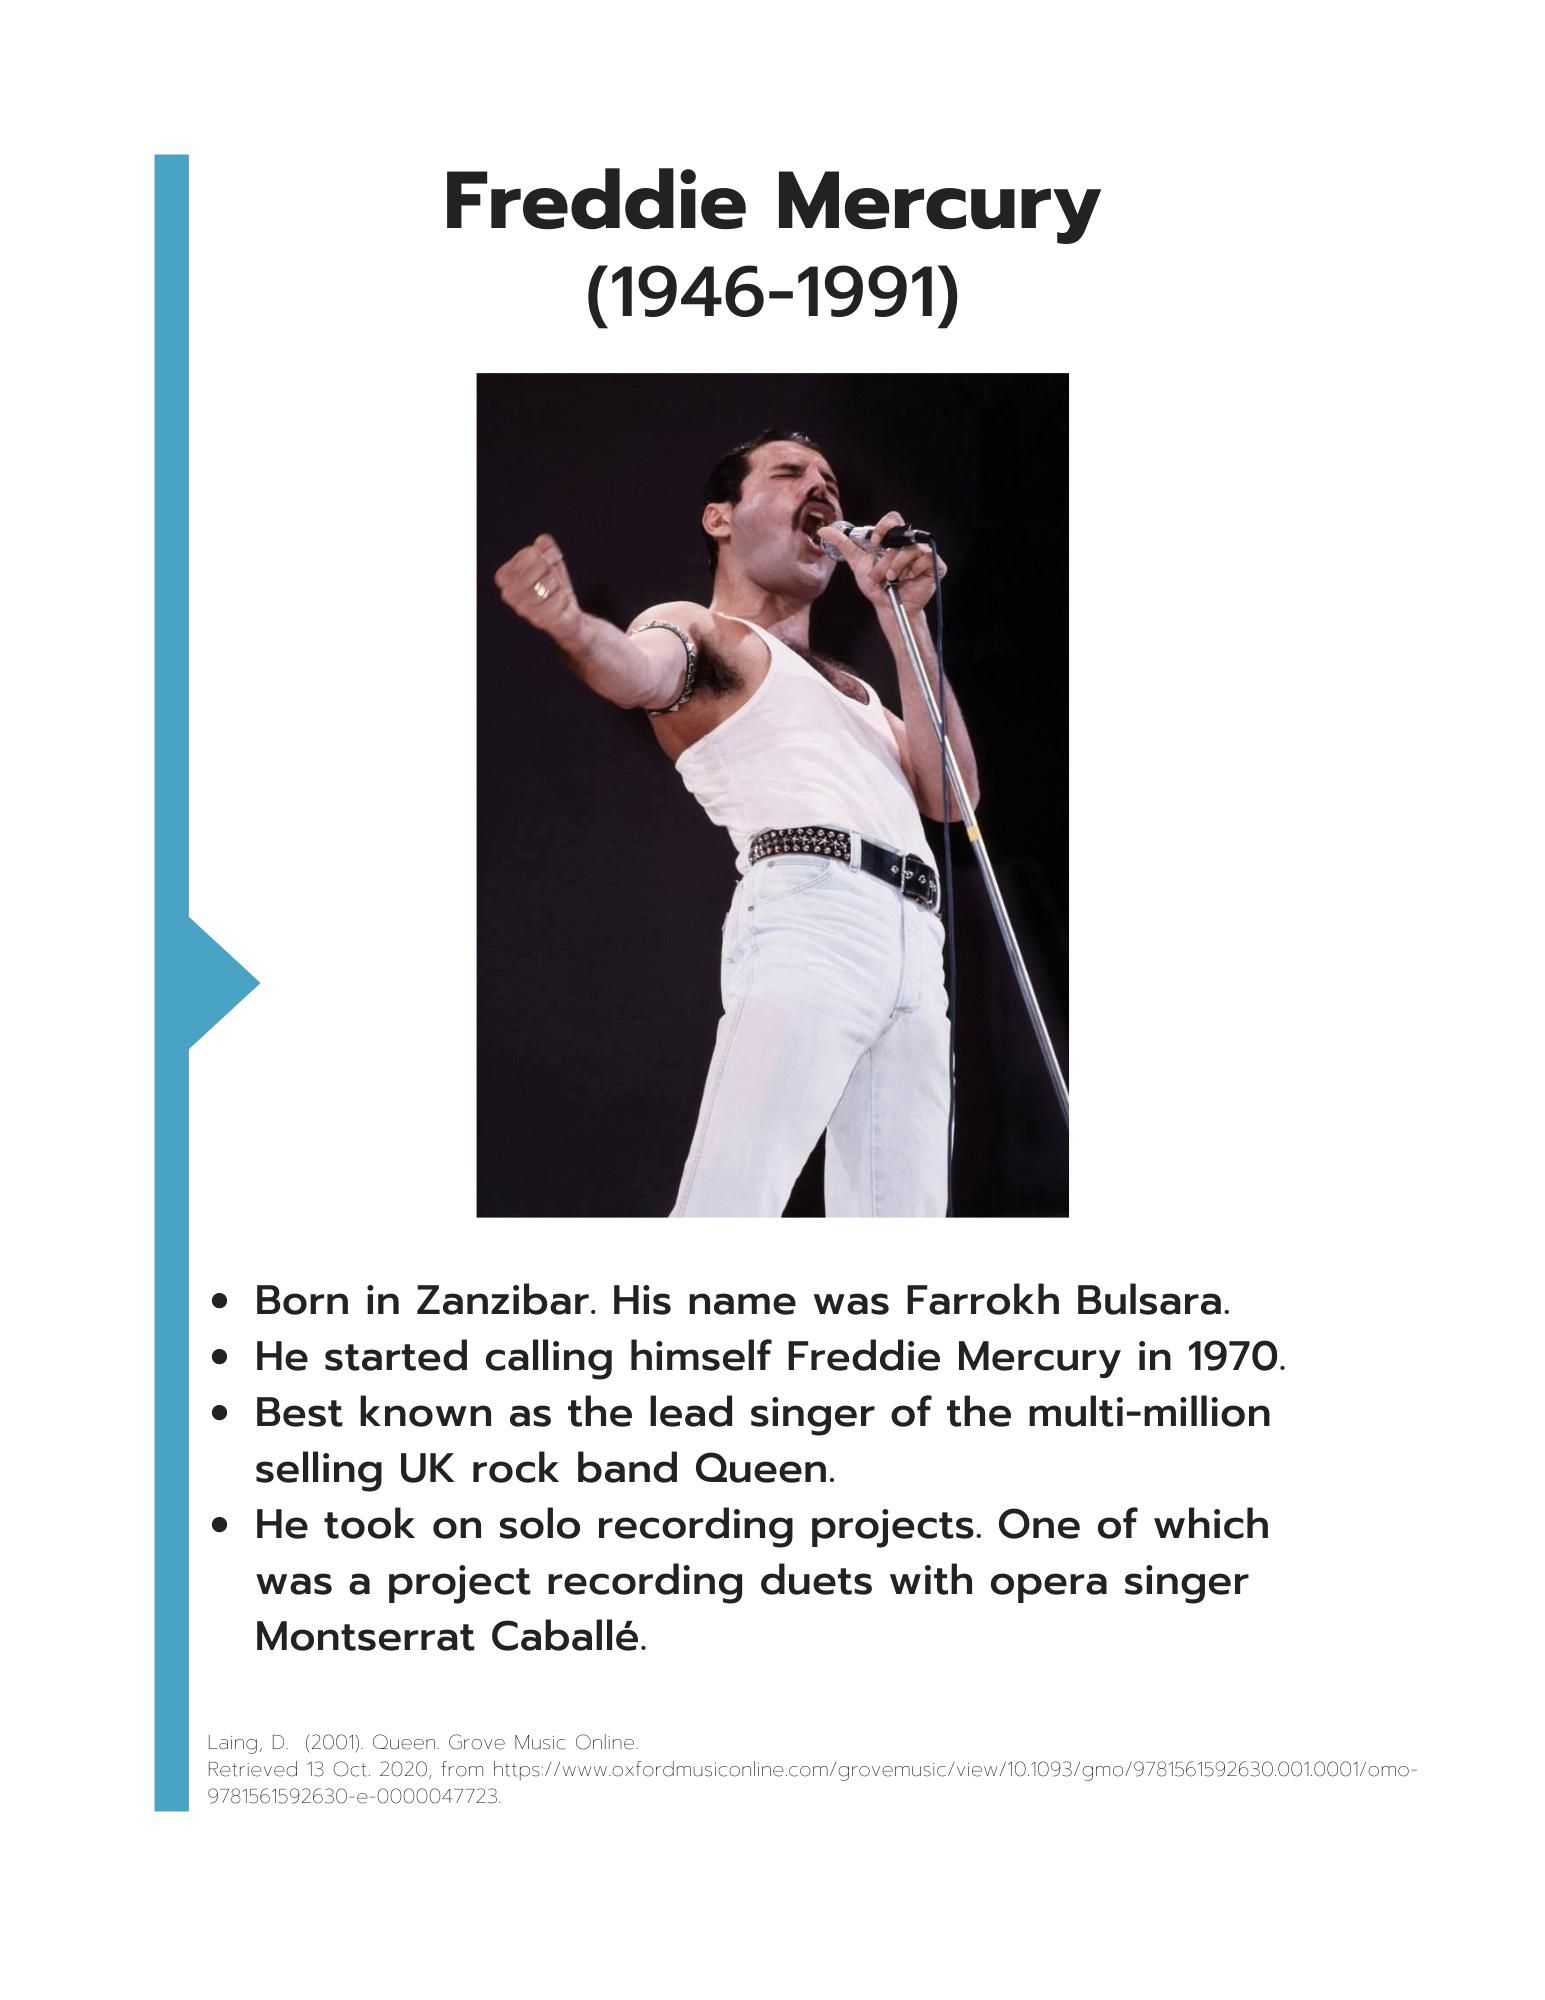 Freddie Mercury information sheet art